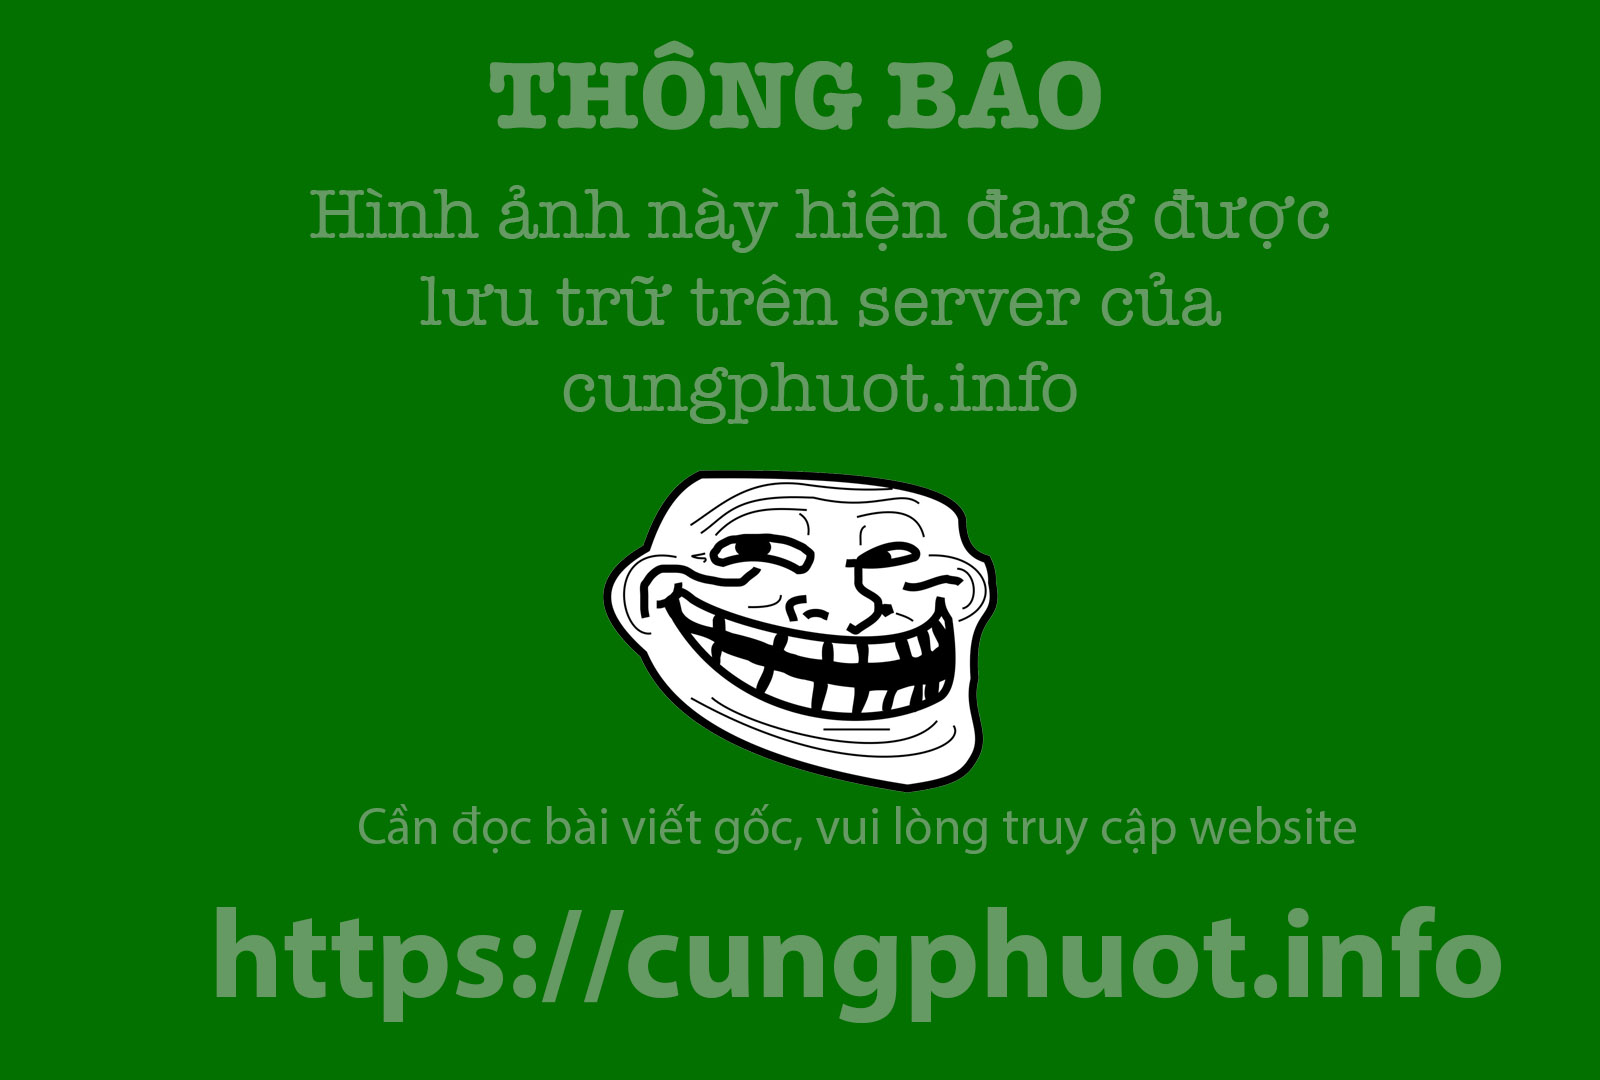 Dan phuot me man ve dep ky vi cua hang Prai o Quang Tri hinh anh 11